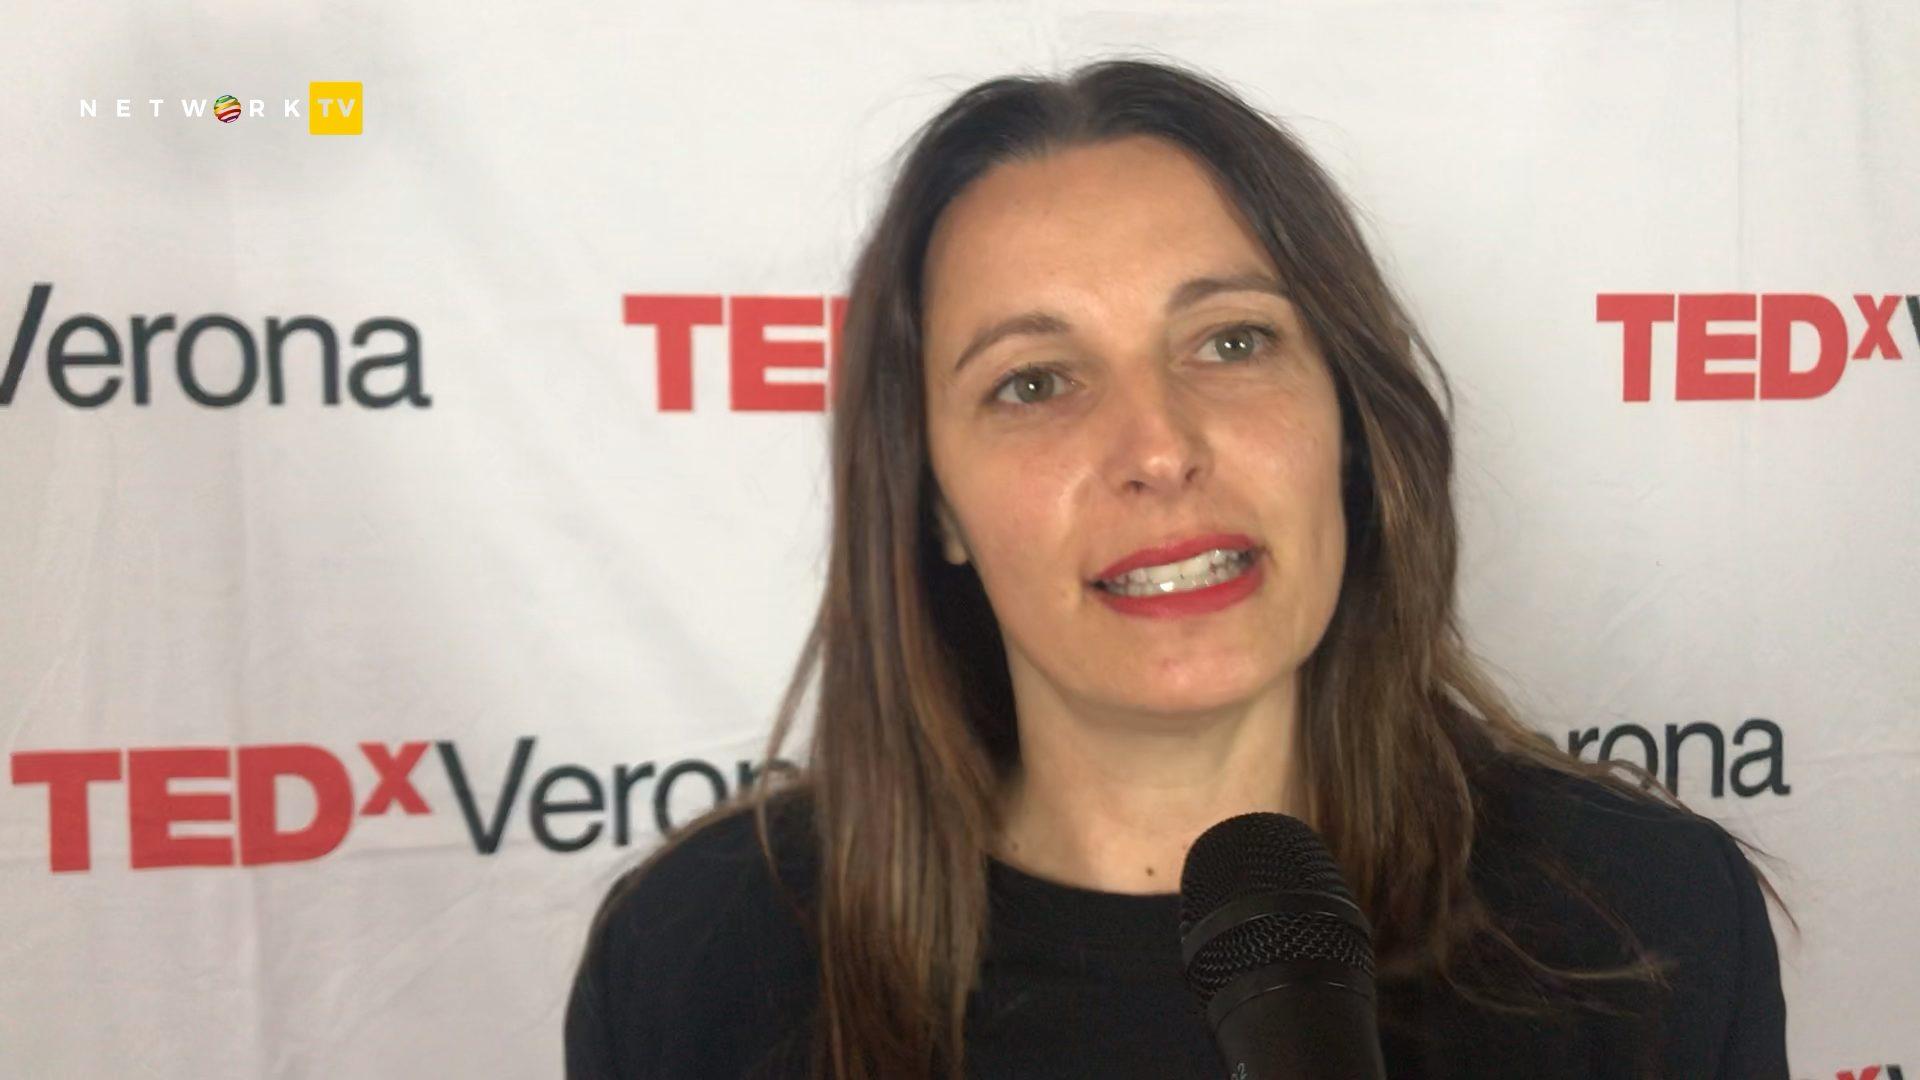 TedxVerona